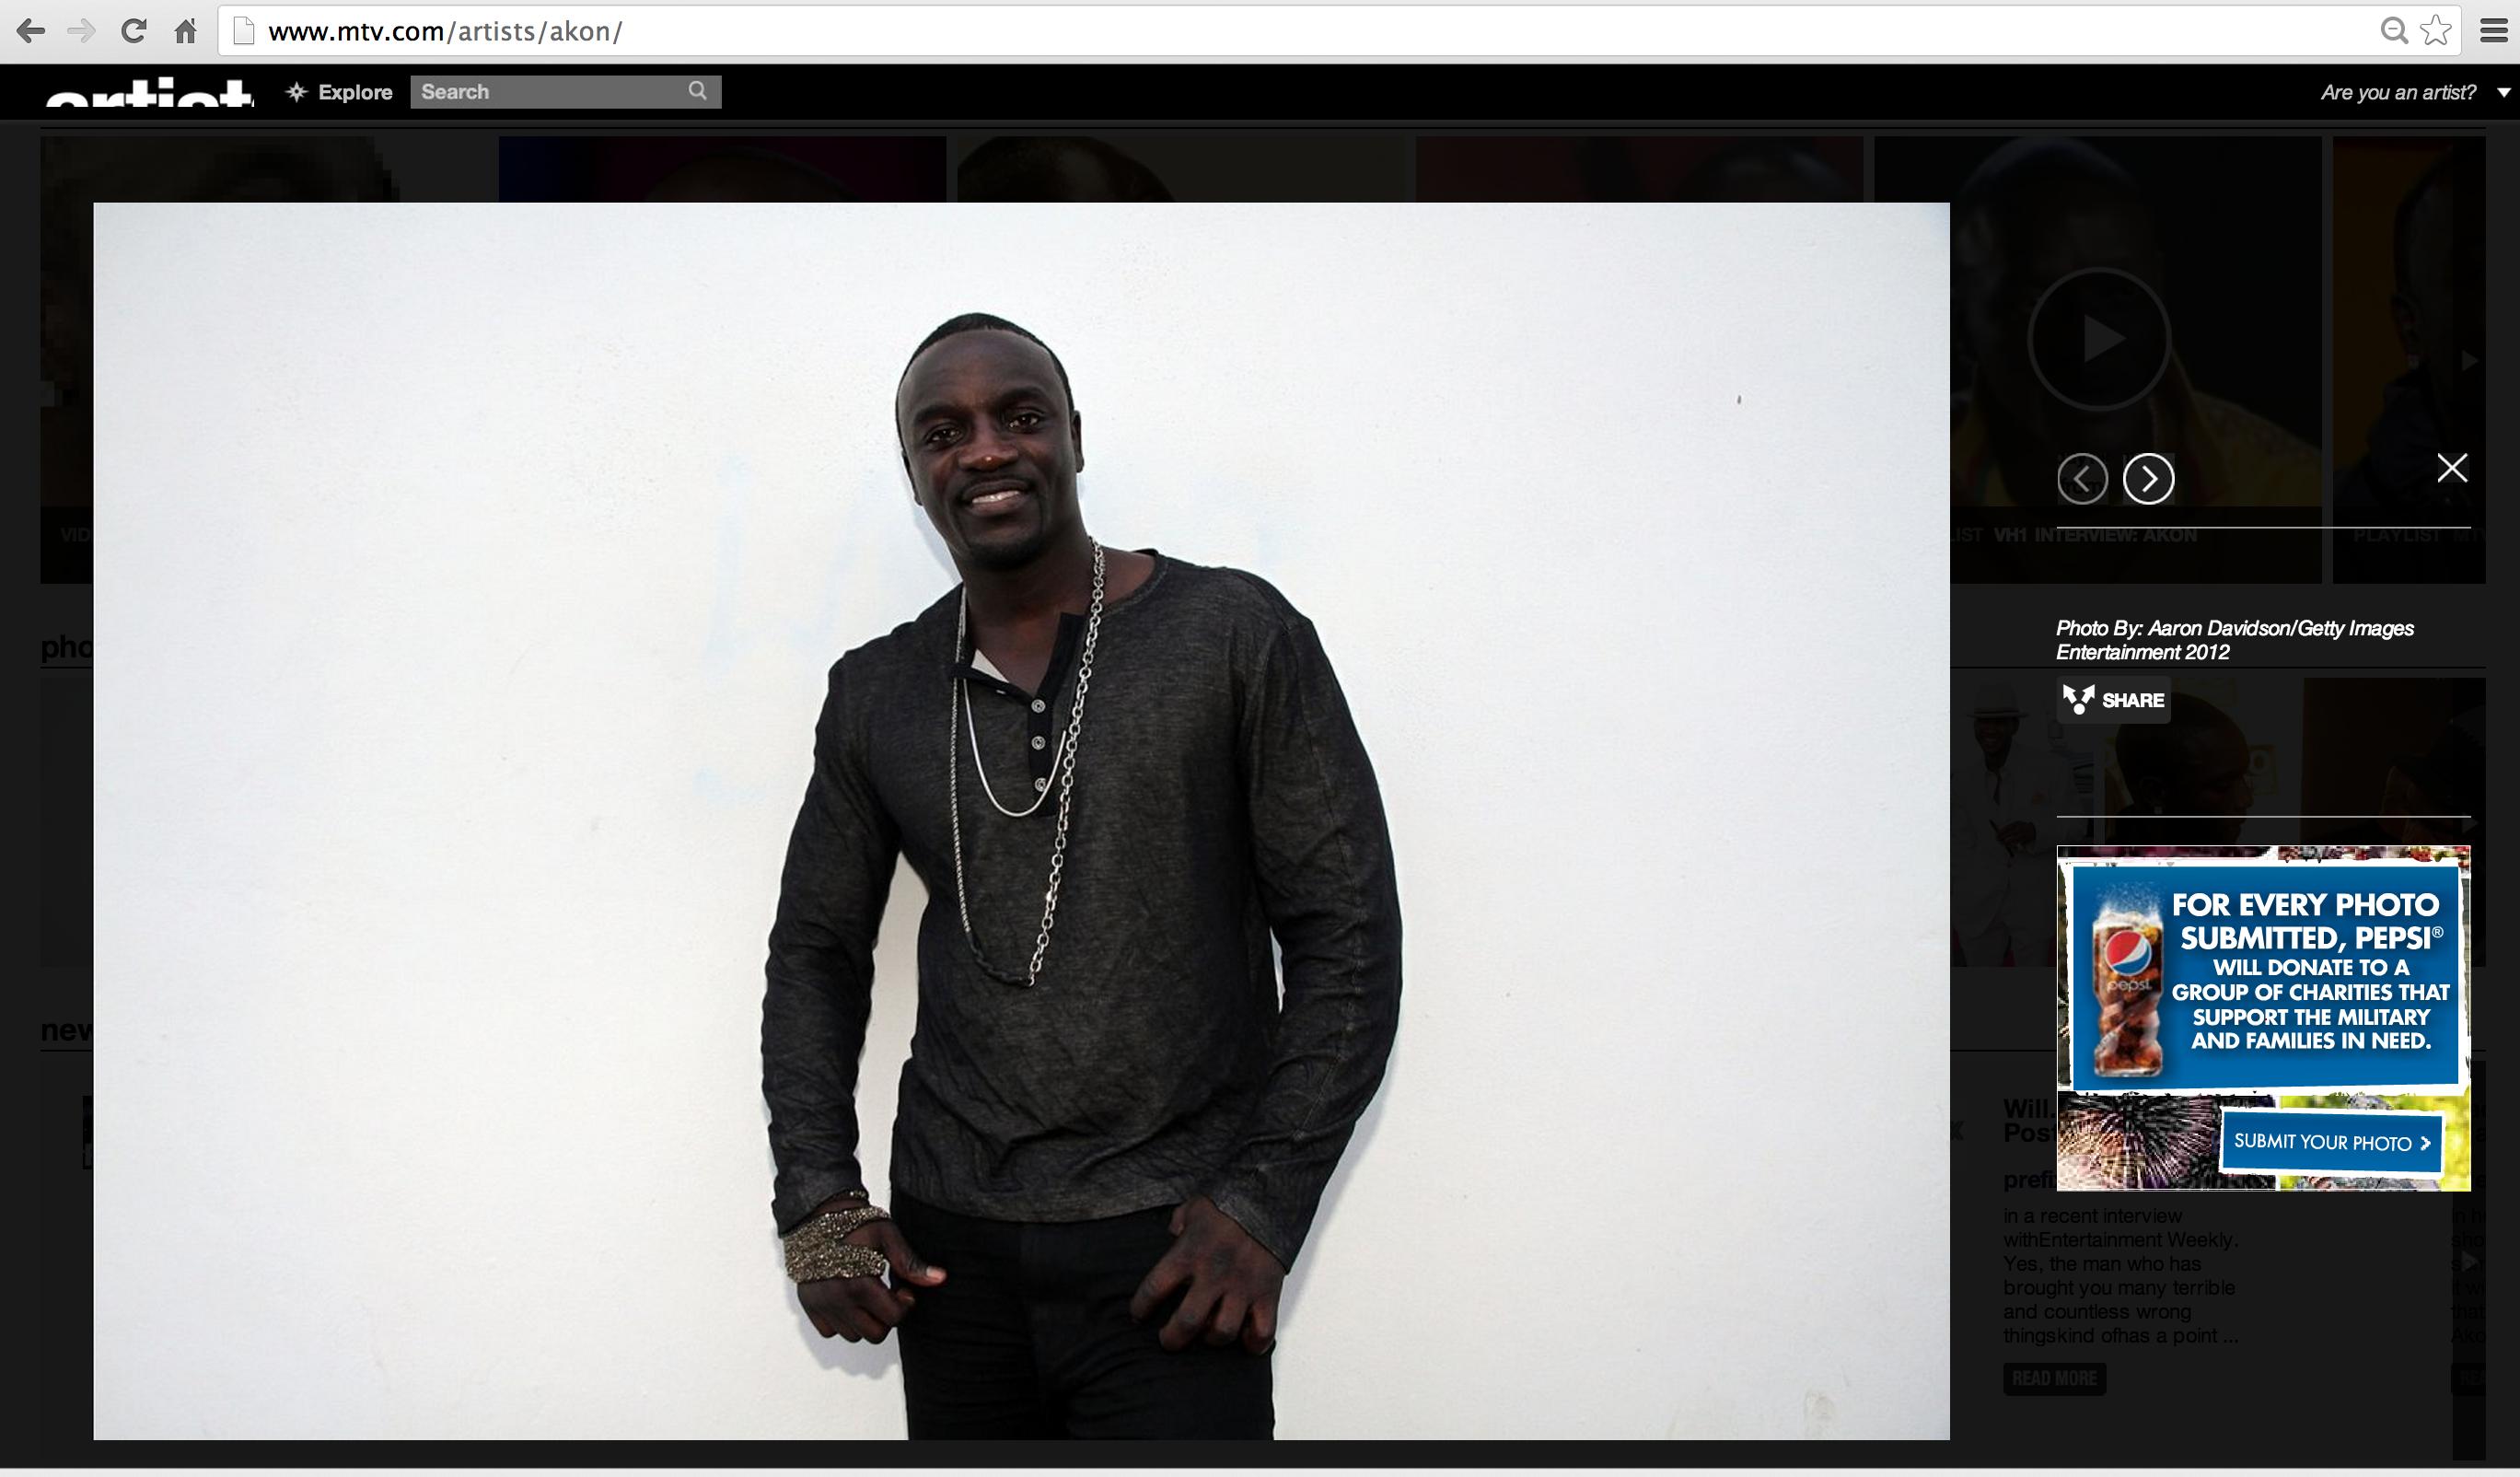 Akon on mtv.com miami